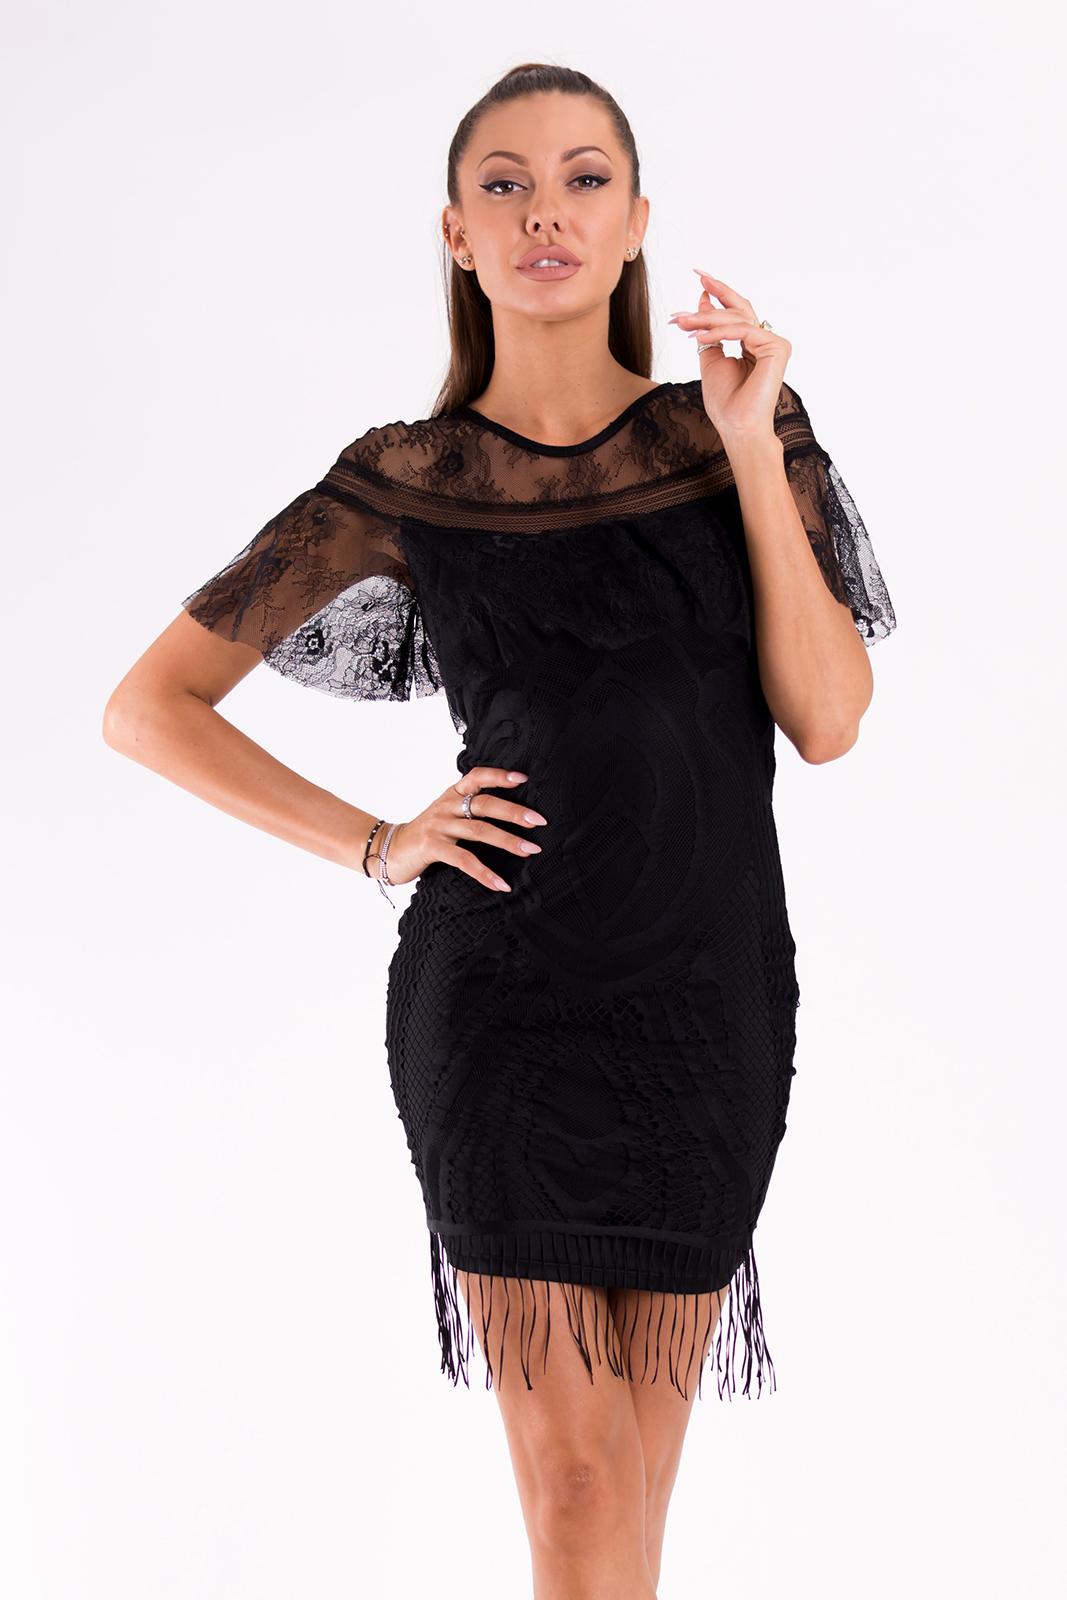 SOKY SOKA  DRESS BLACK 49010-1